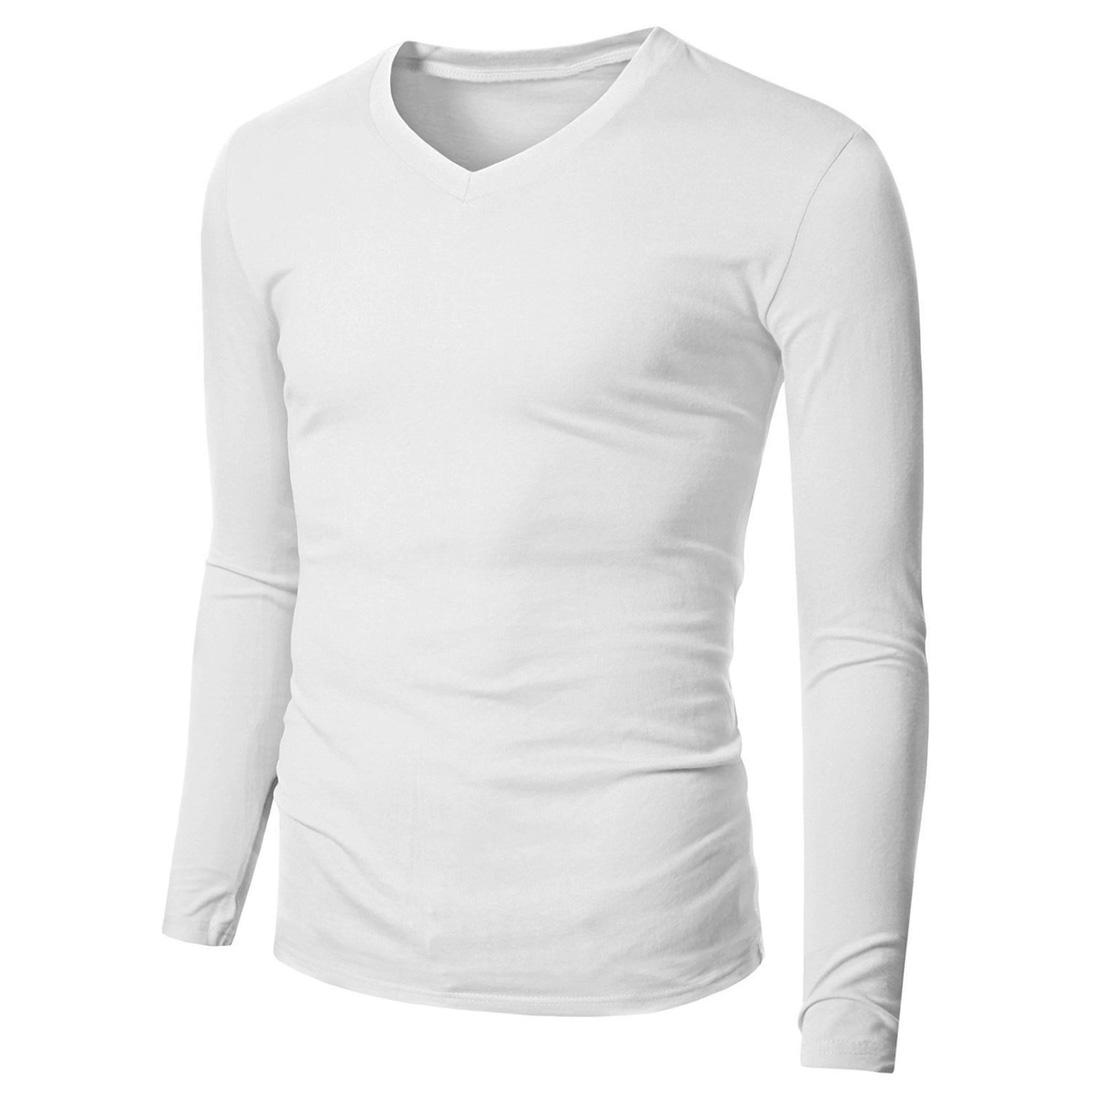 T shirt white colour - Mens Cotton Basic Tee Shirts T Shirt Long